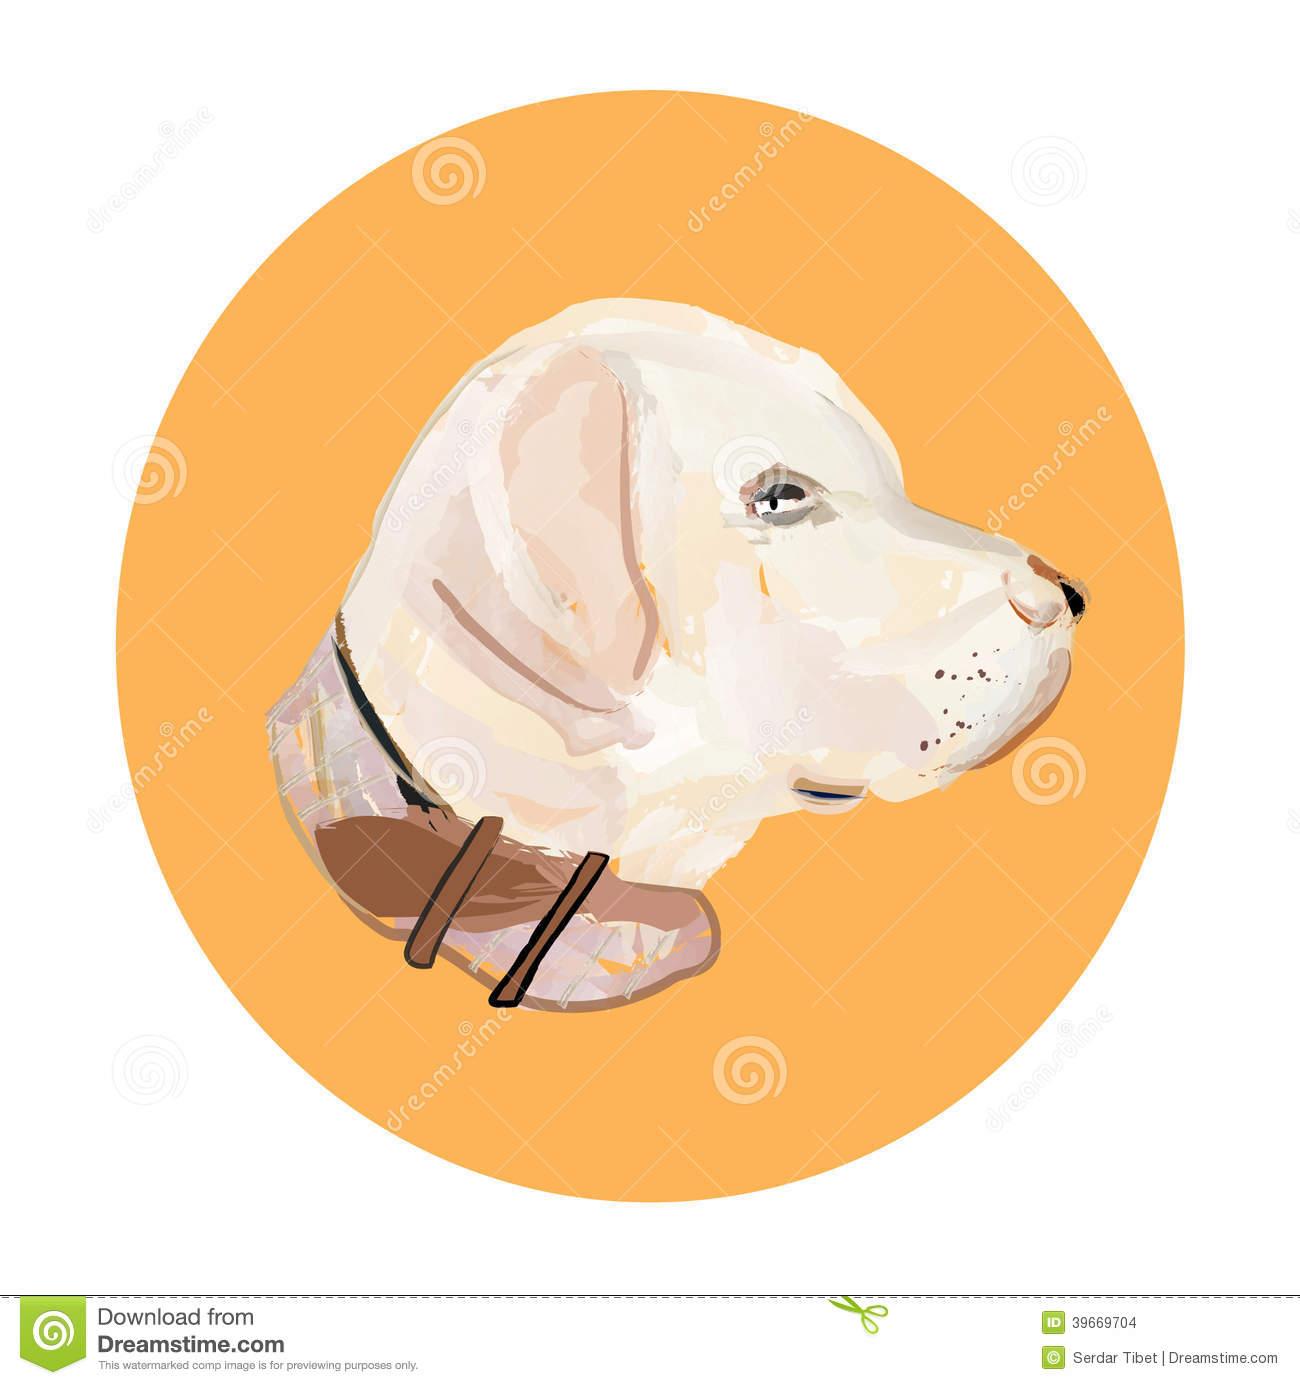 Kangal Dog clipart #12, Download drawings